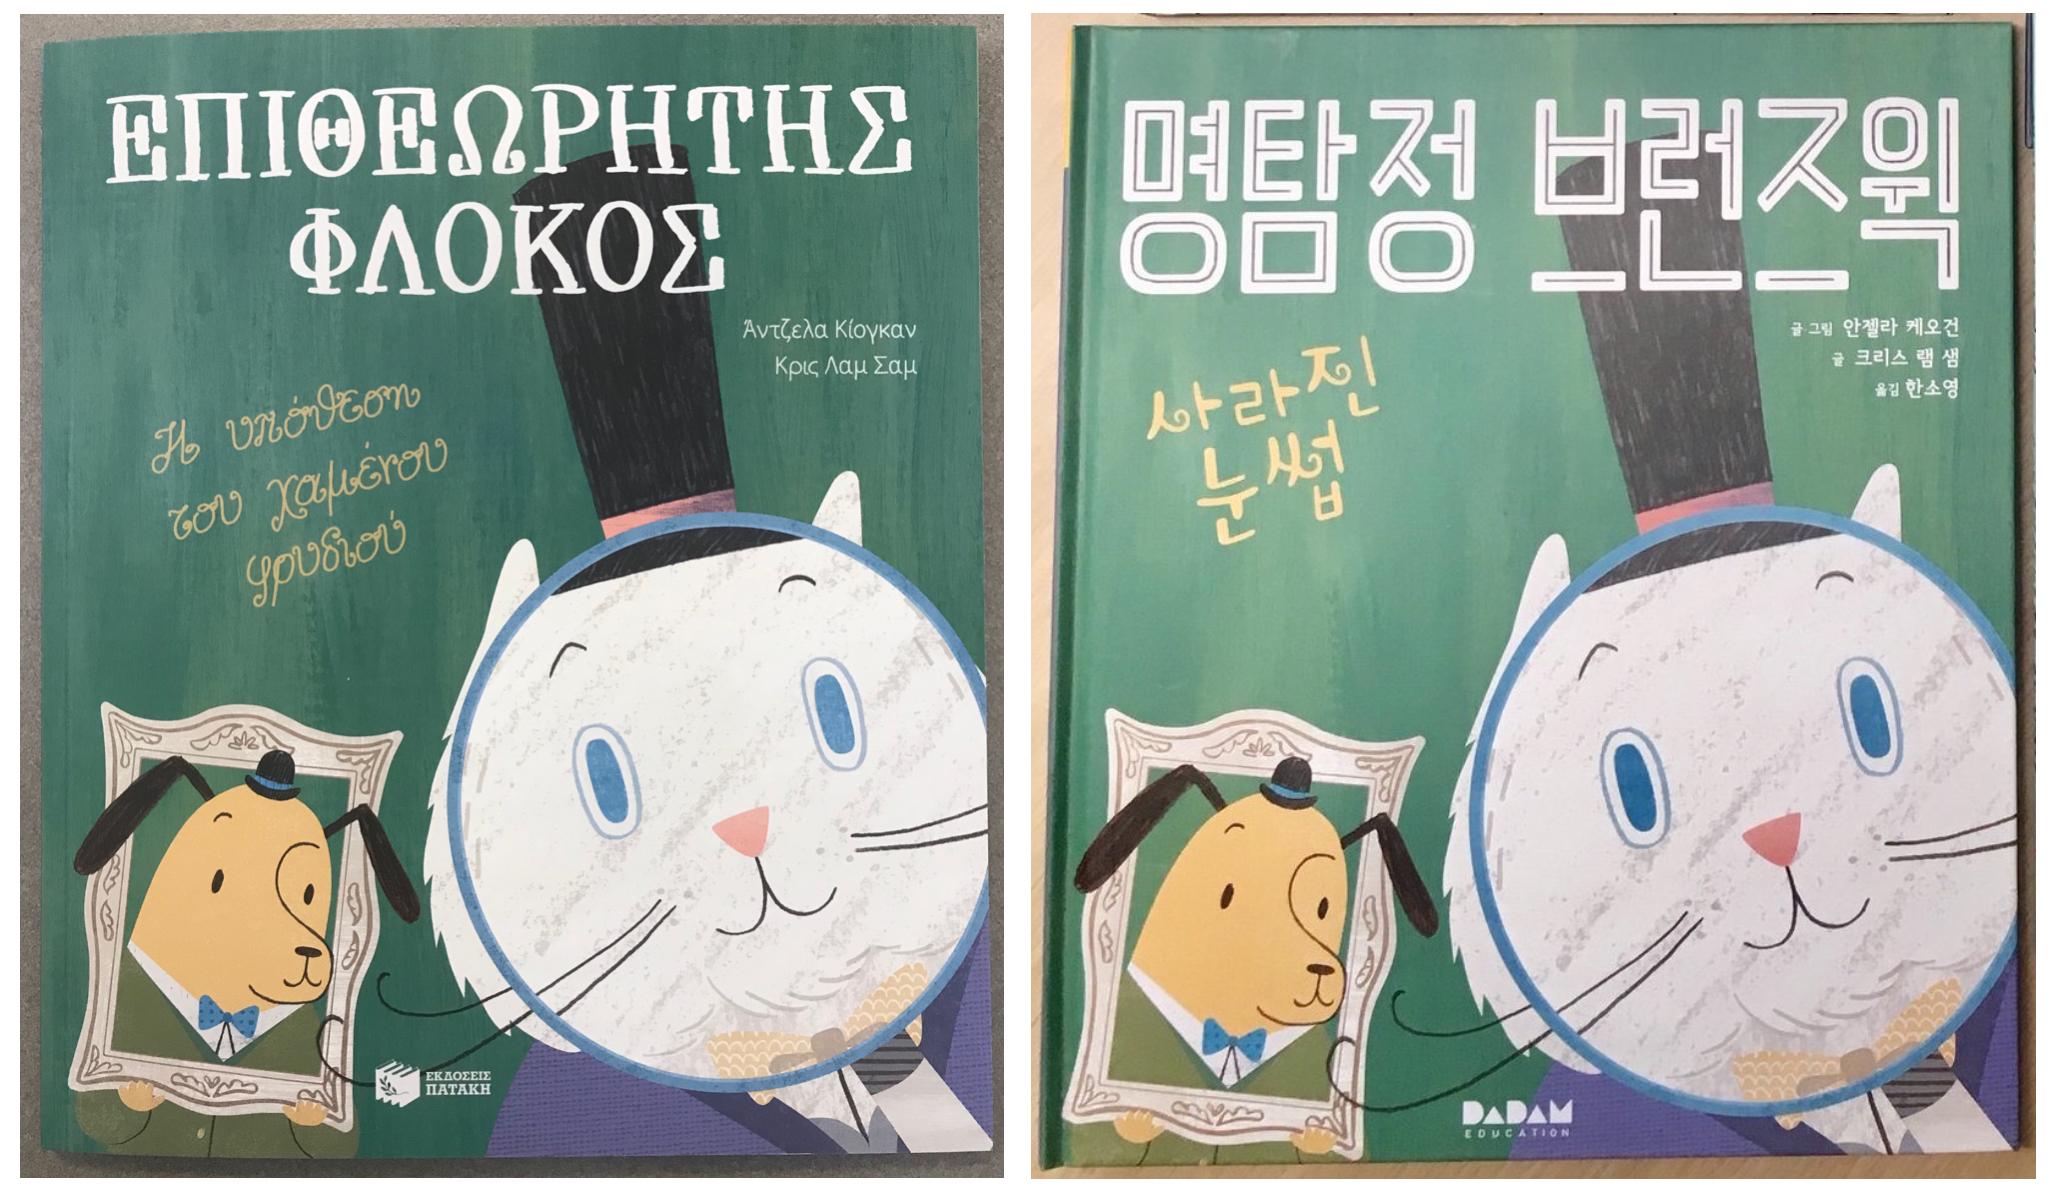 Inspector Brunswick editions in Greek and Korean